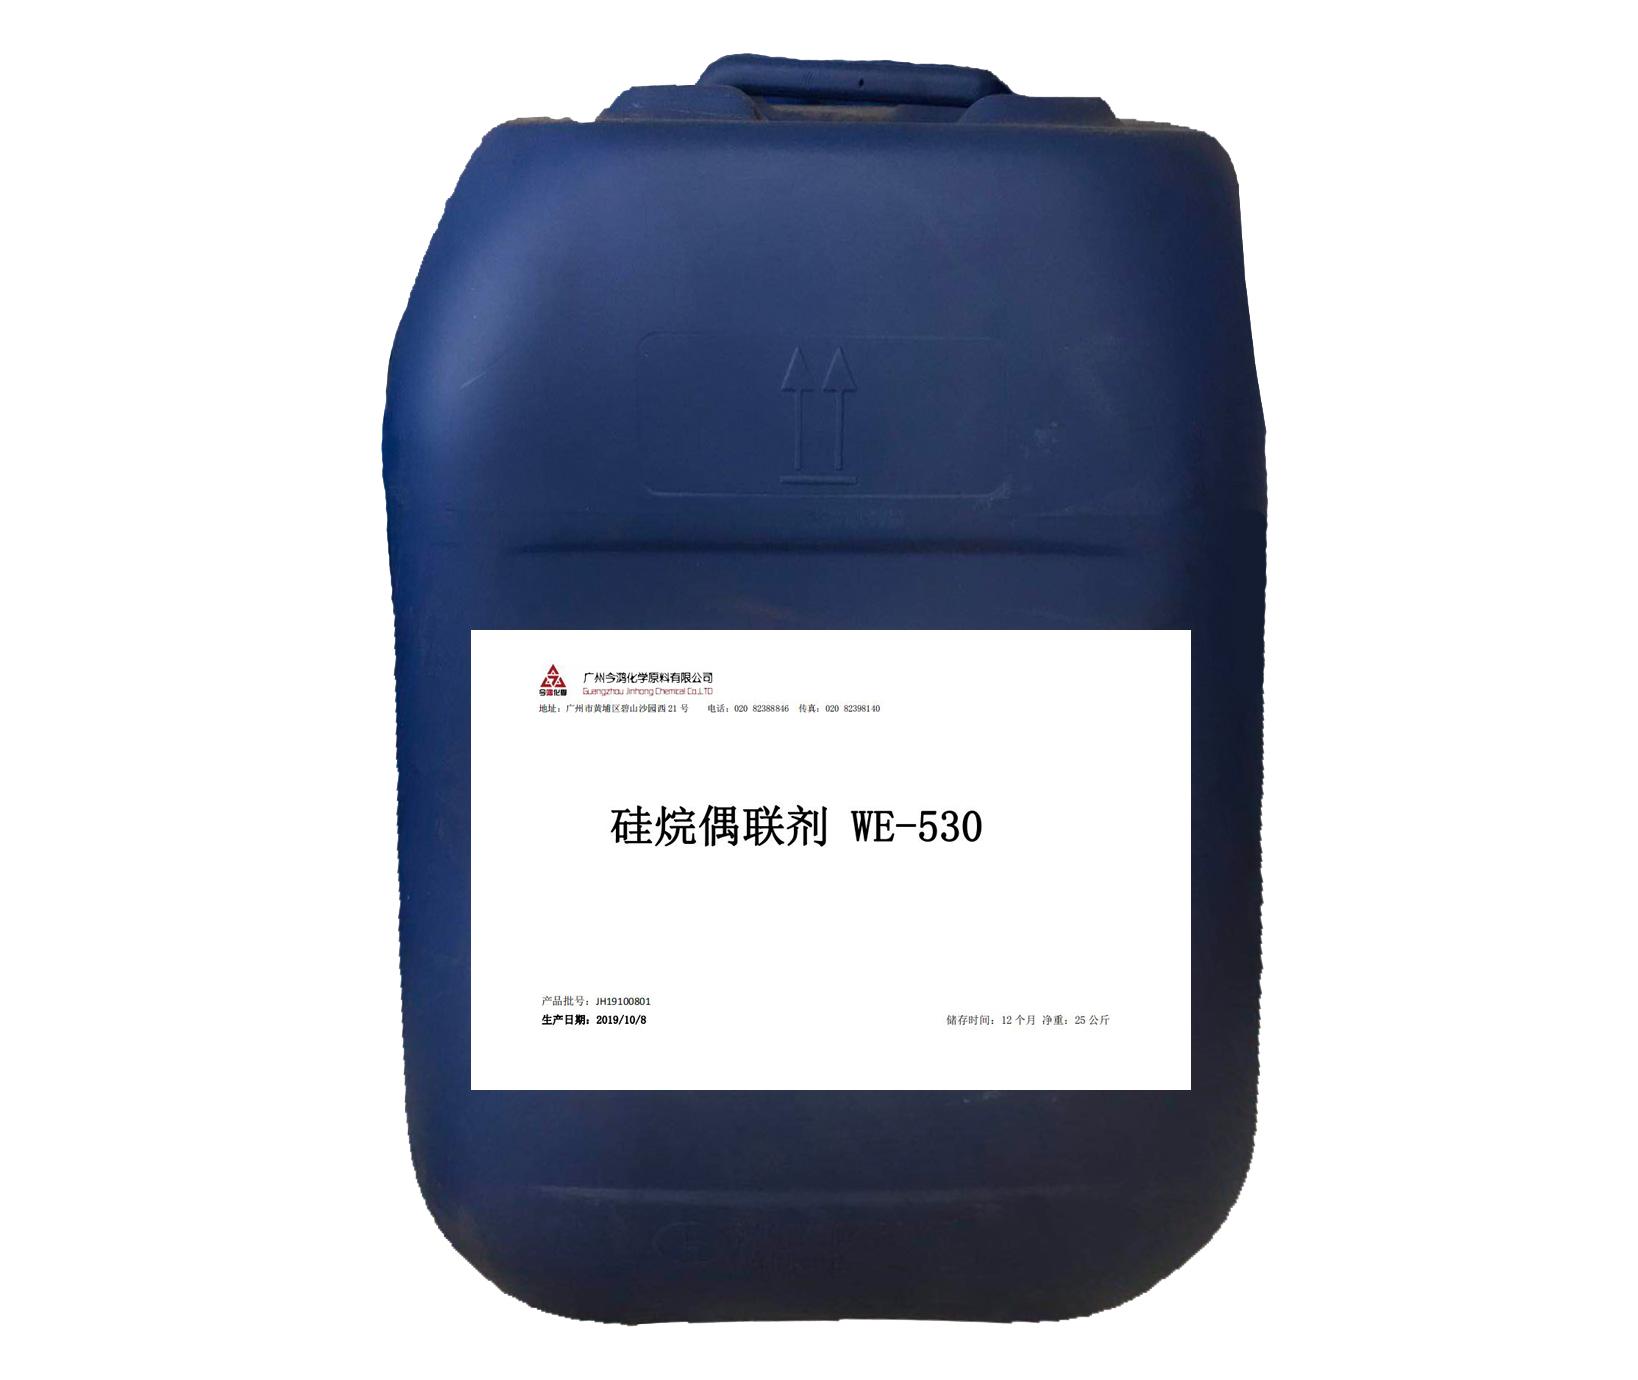 硅烷偶联剂WE-530/Coatosil MP200